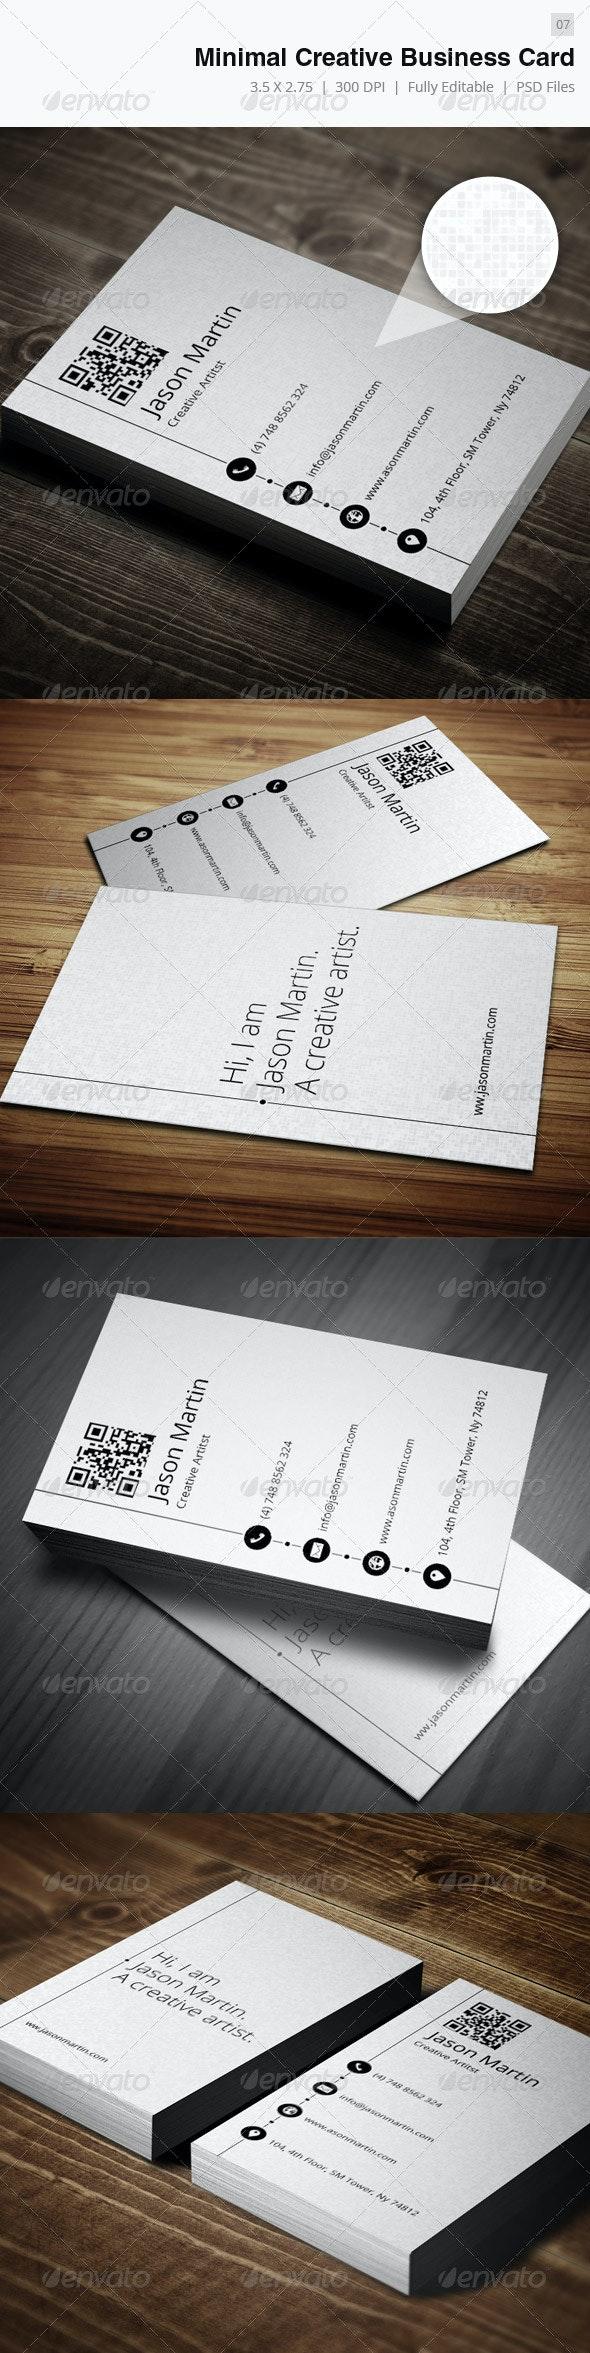 Creative Minimal Business Card - Creative Business Cards